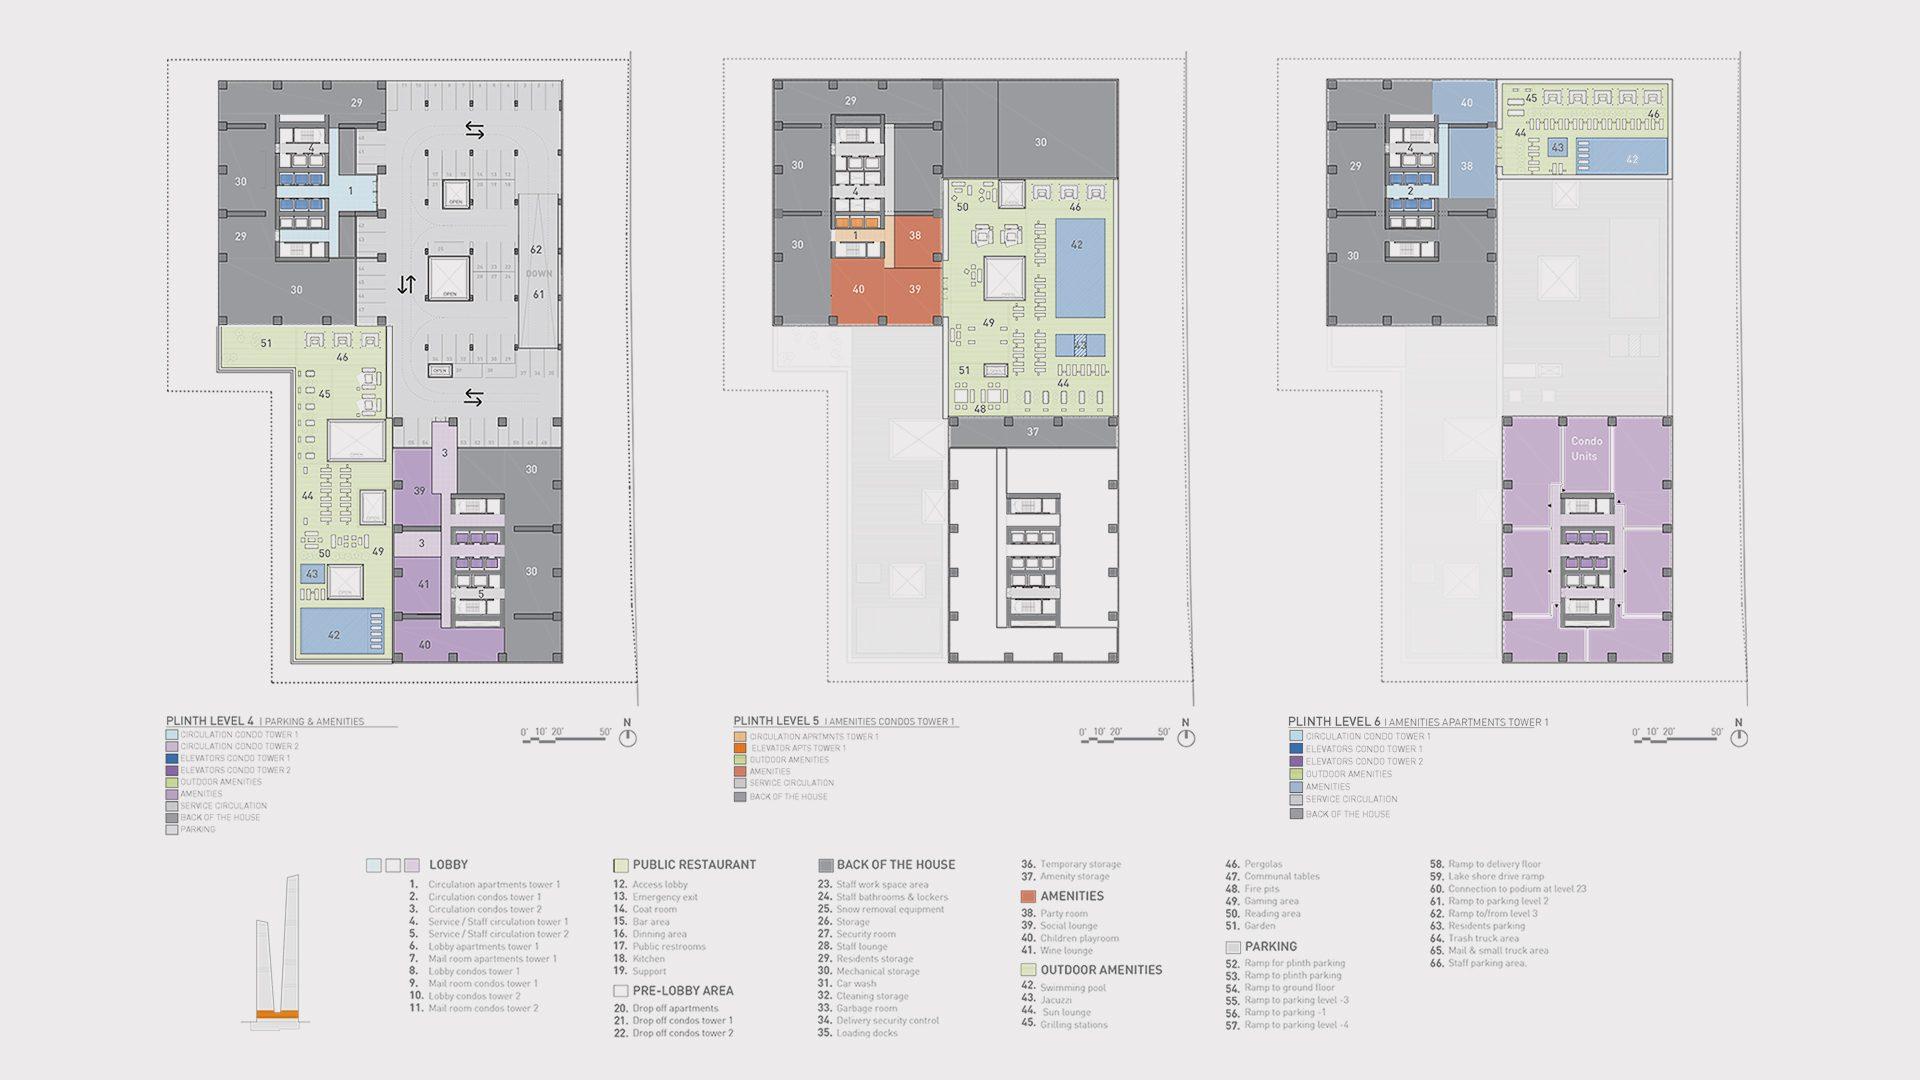 032_Plans-Upper Plinth